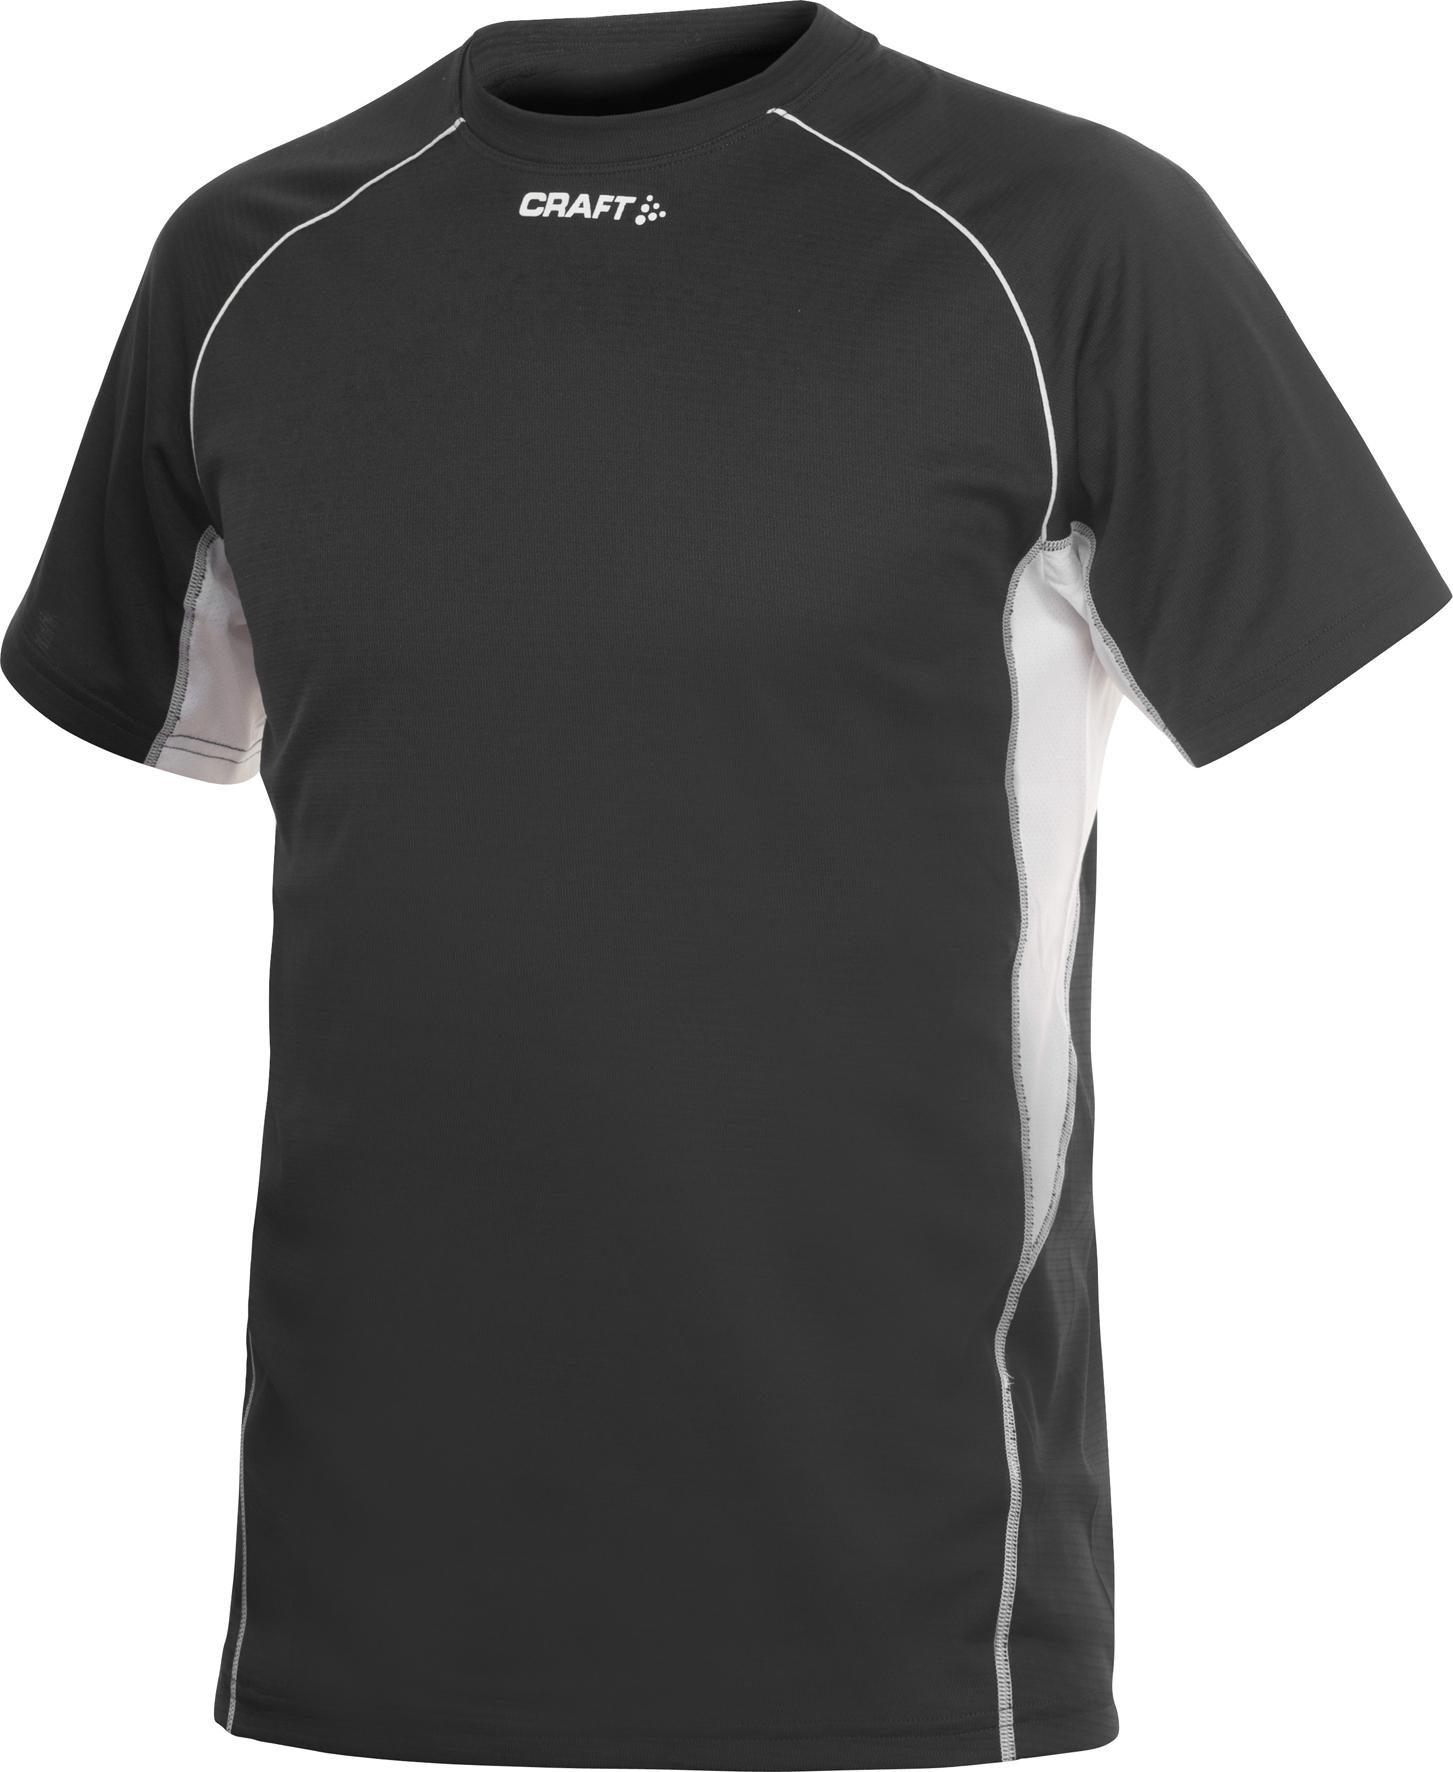 Футболка Craft Track and Field мужская черная